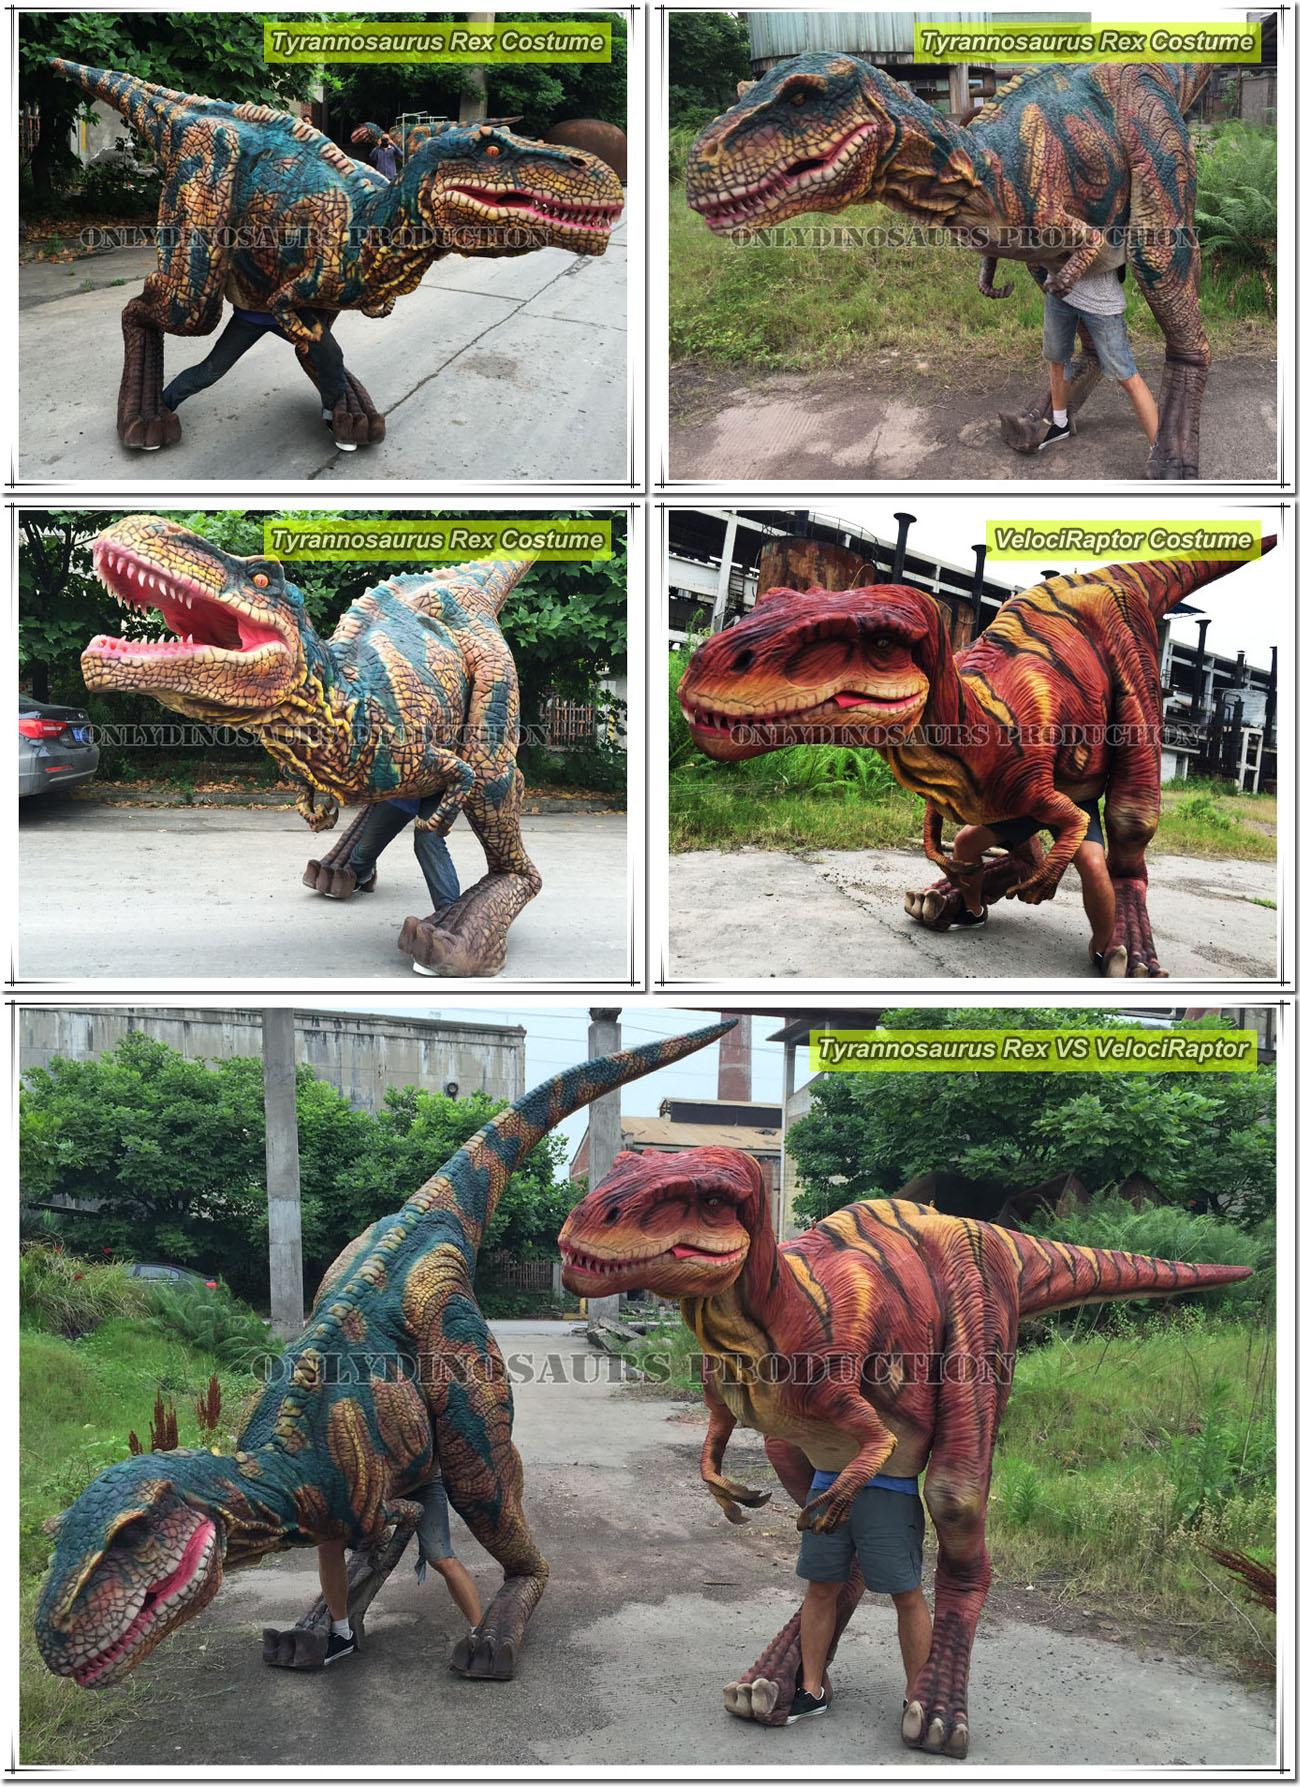 Dinosaur Costumes Show-02